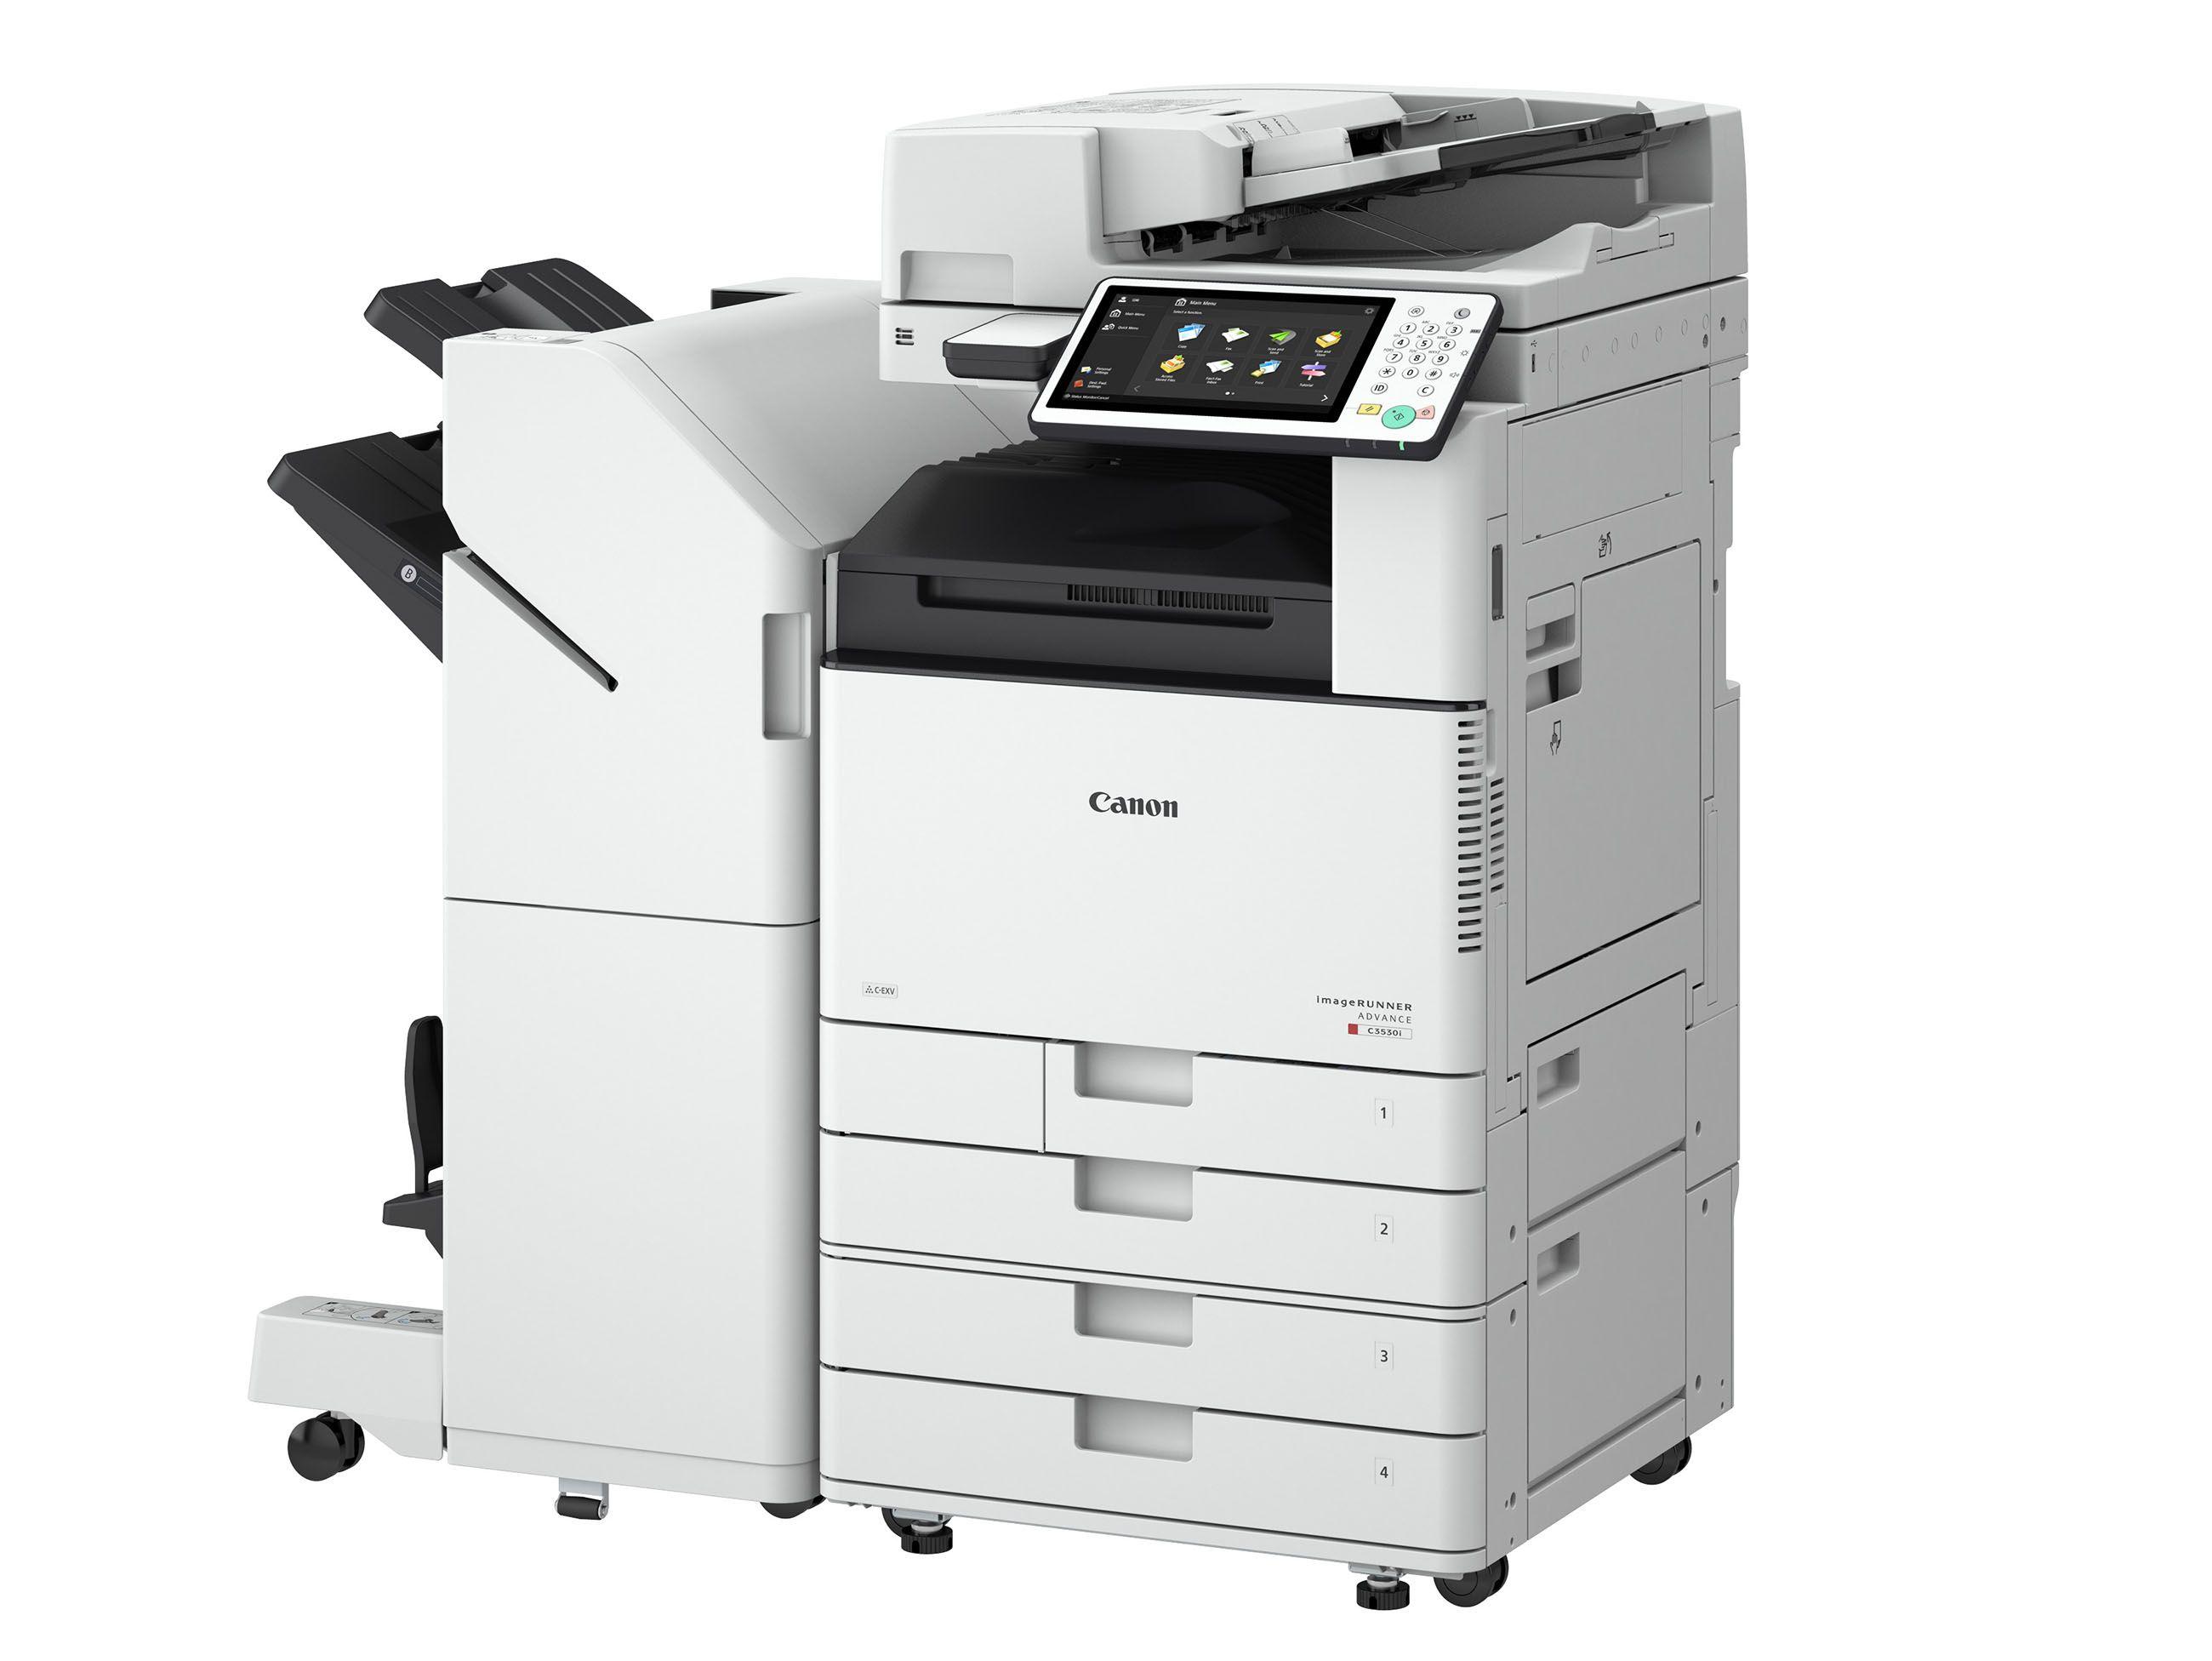 Canon imageRUNNER ADVANCE C3530i Multifunktionsdrucker